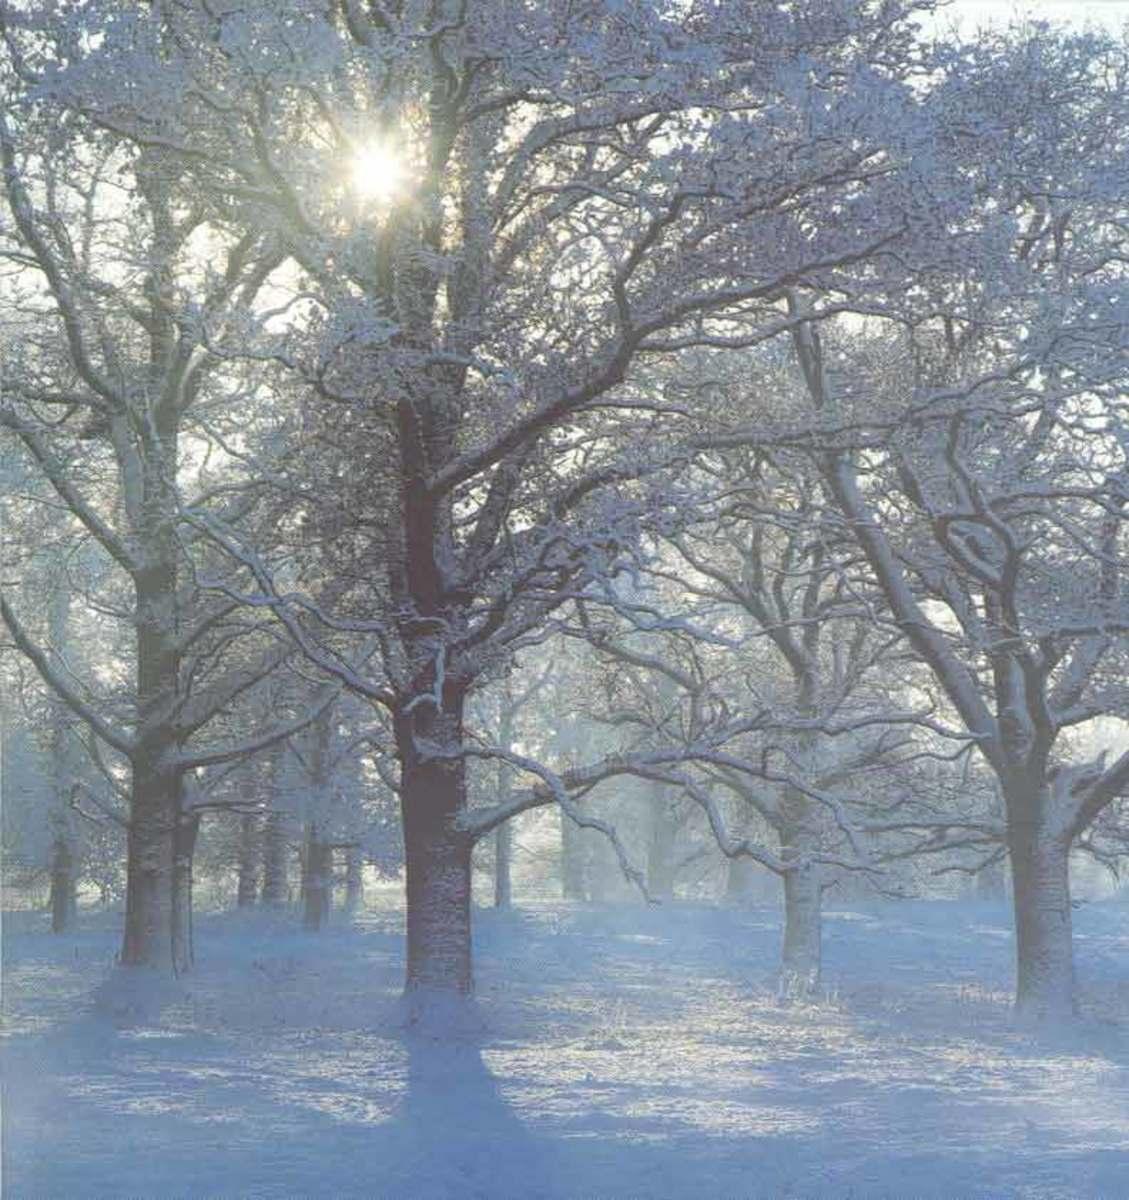 5-ways-to-predict-snow